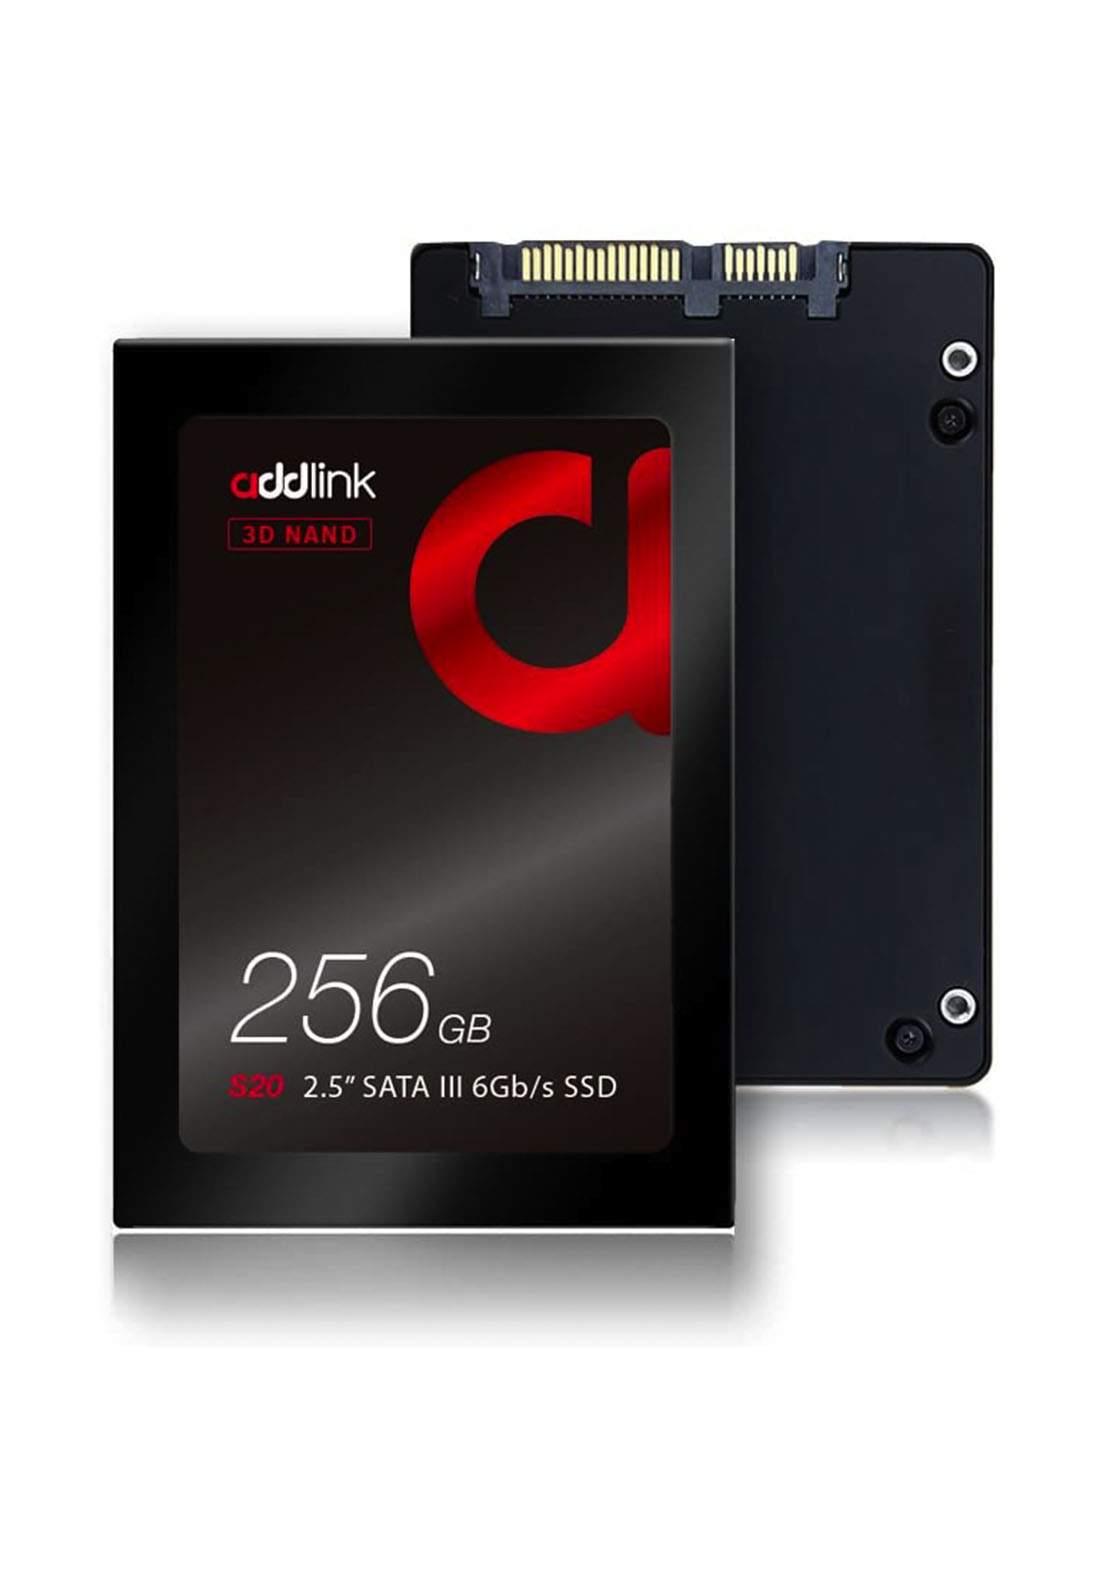 Addlink S20 256GB SSD 2.5 in SATA III 6Gbs 3D NAND Internal Solid State Drive - Black هارد داخلي